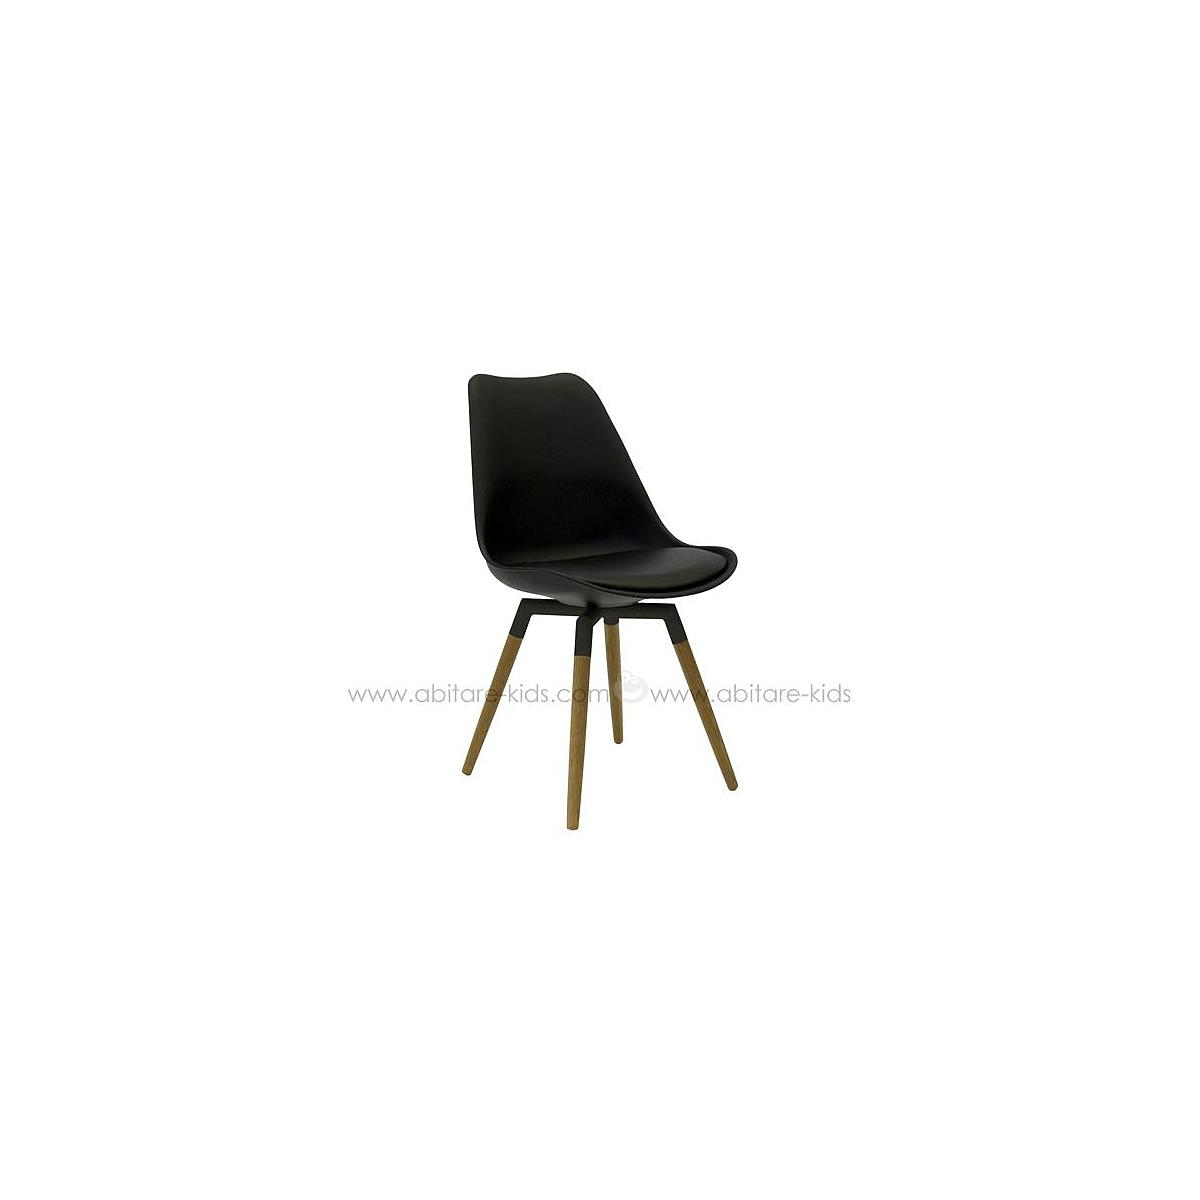 C-BAR by Tenzo Chaise Gina-Fido Assise noire et pied noir/chêne